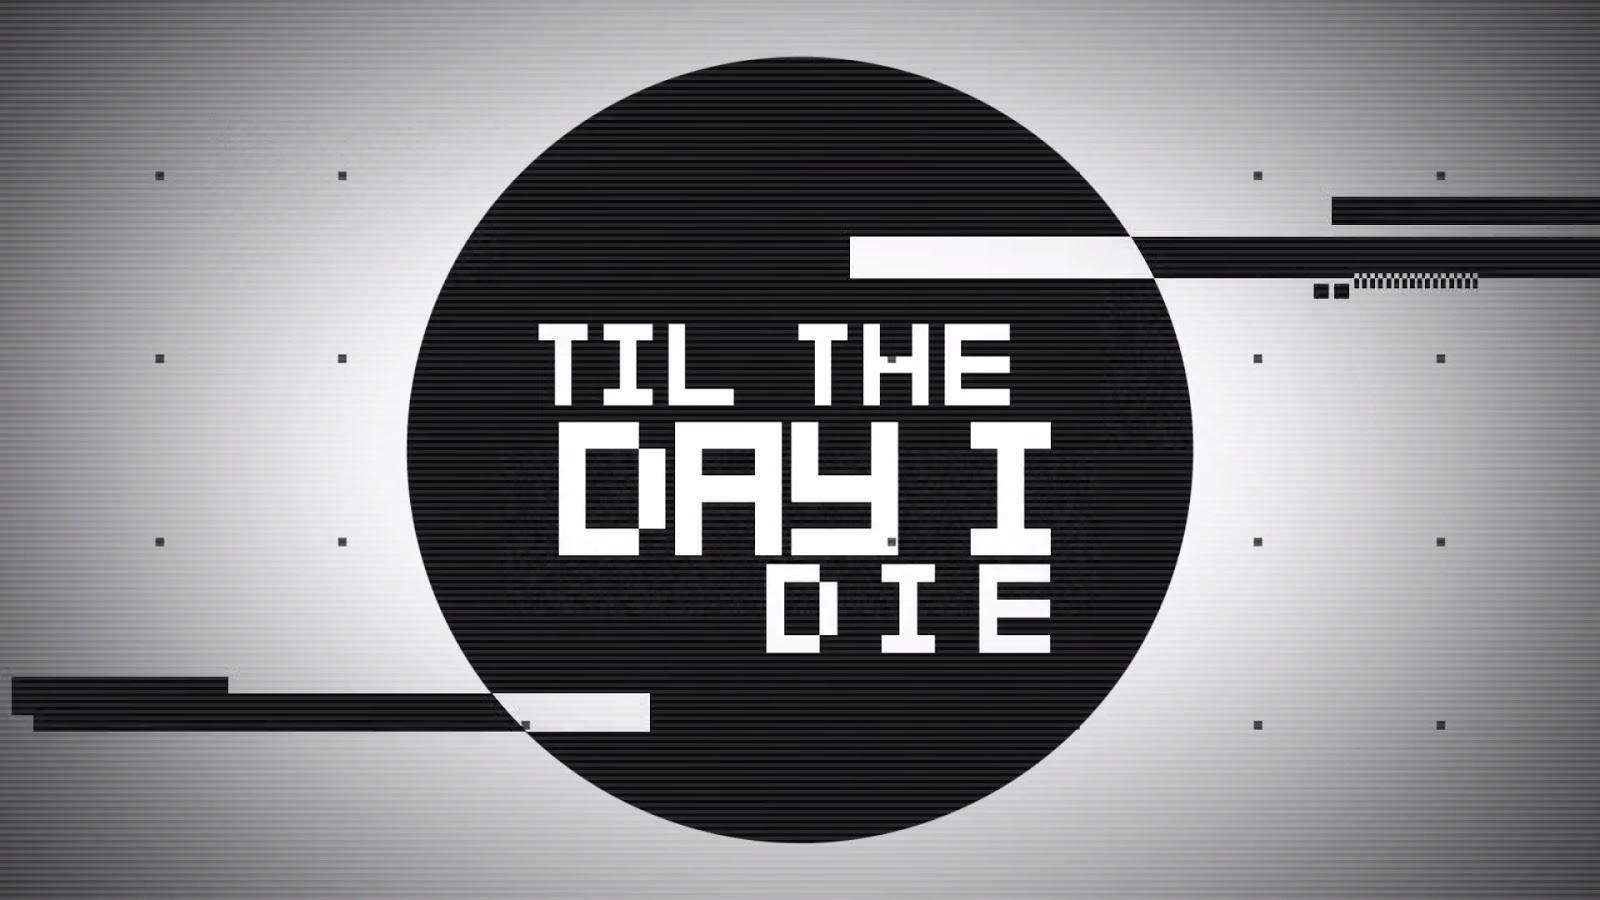 Toby Mac ft NF - Til the day I die - This is not a test